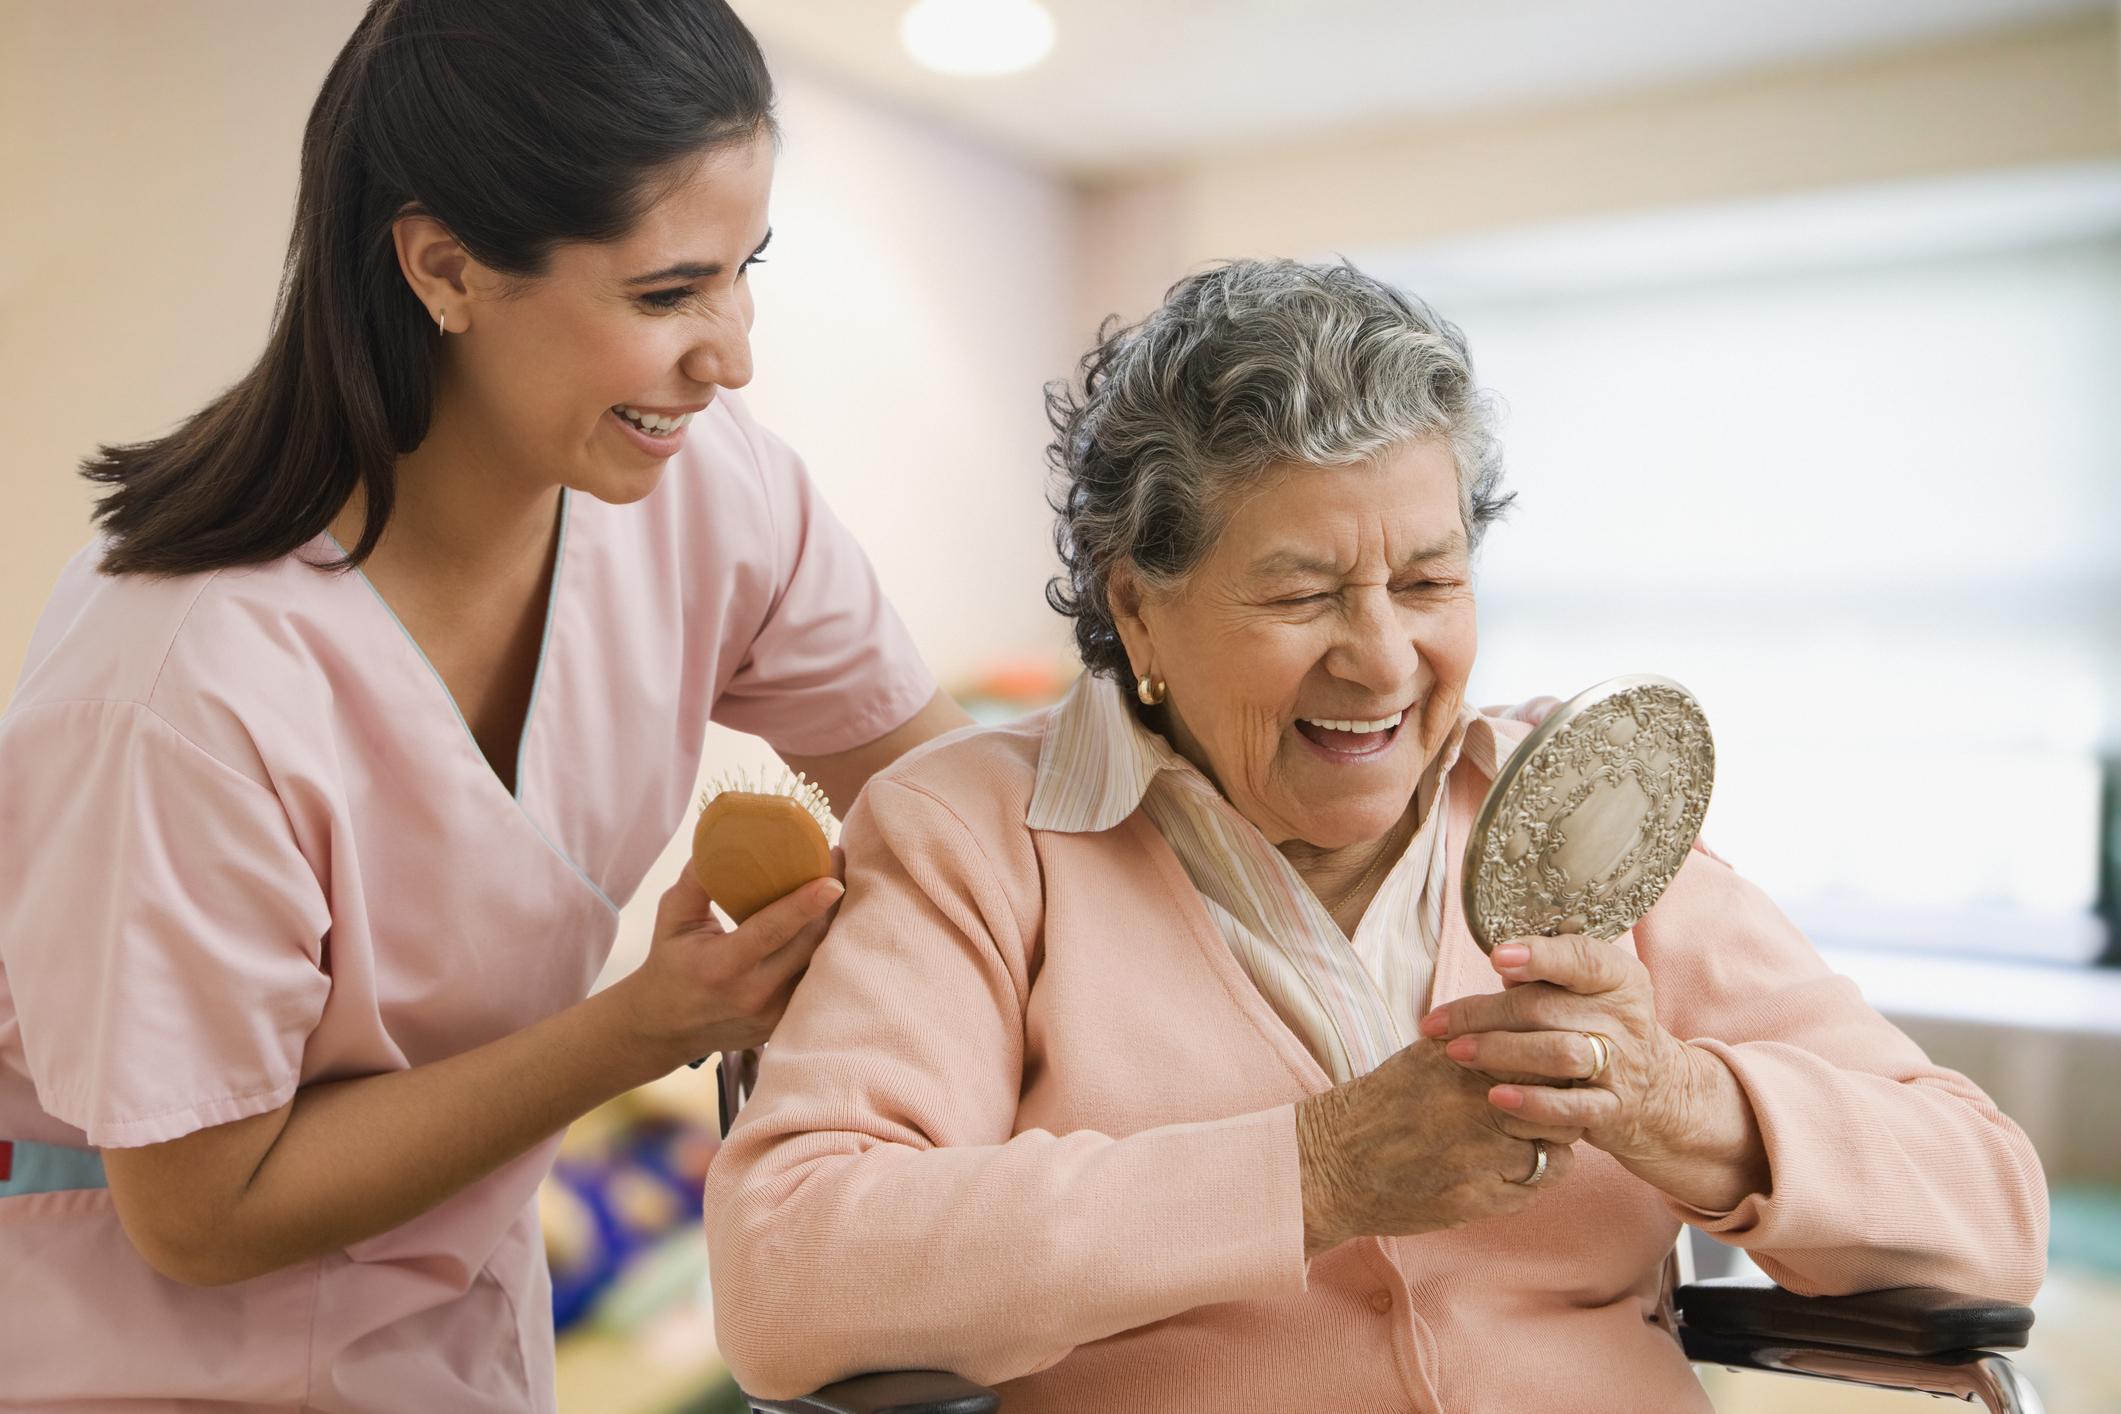 CNA benefits — making someone laugh